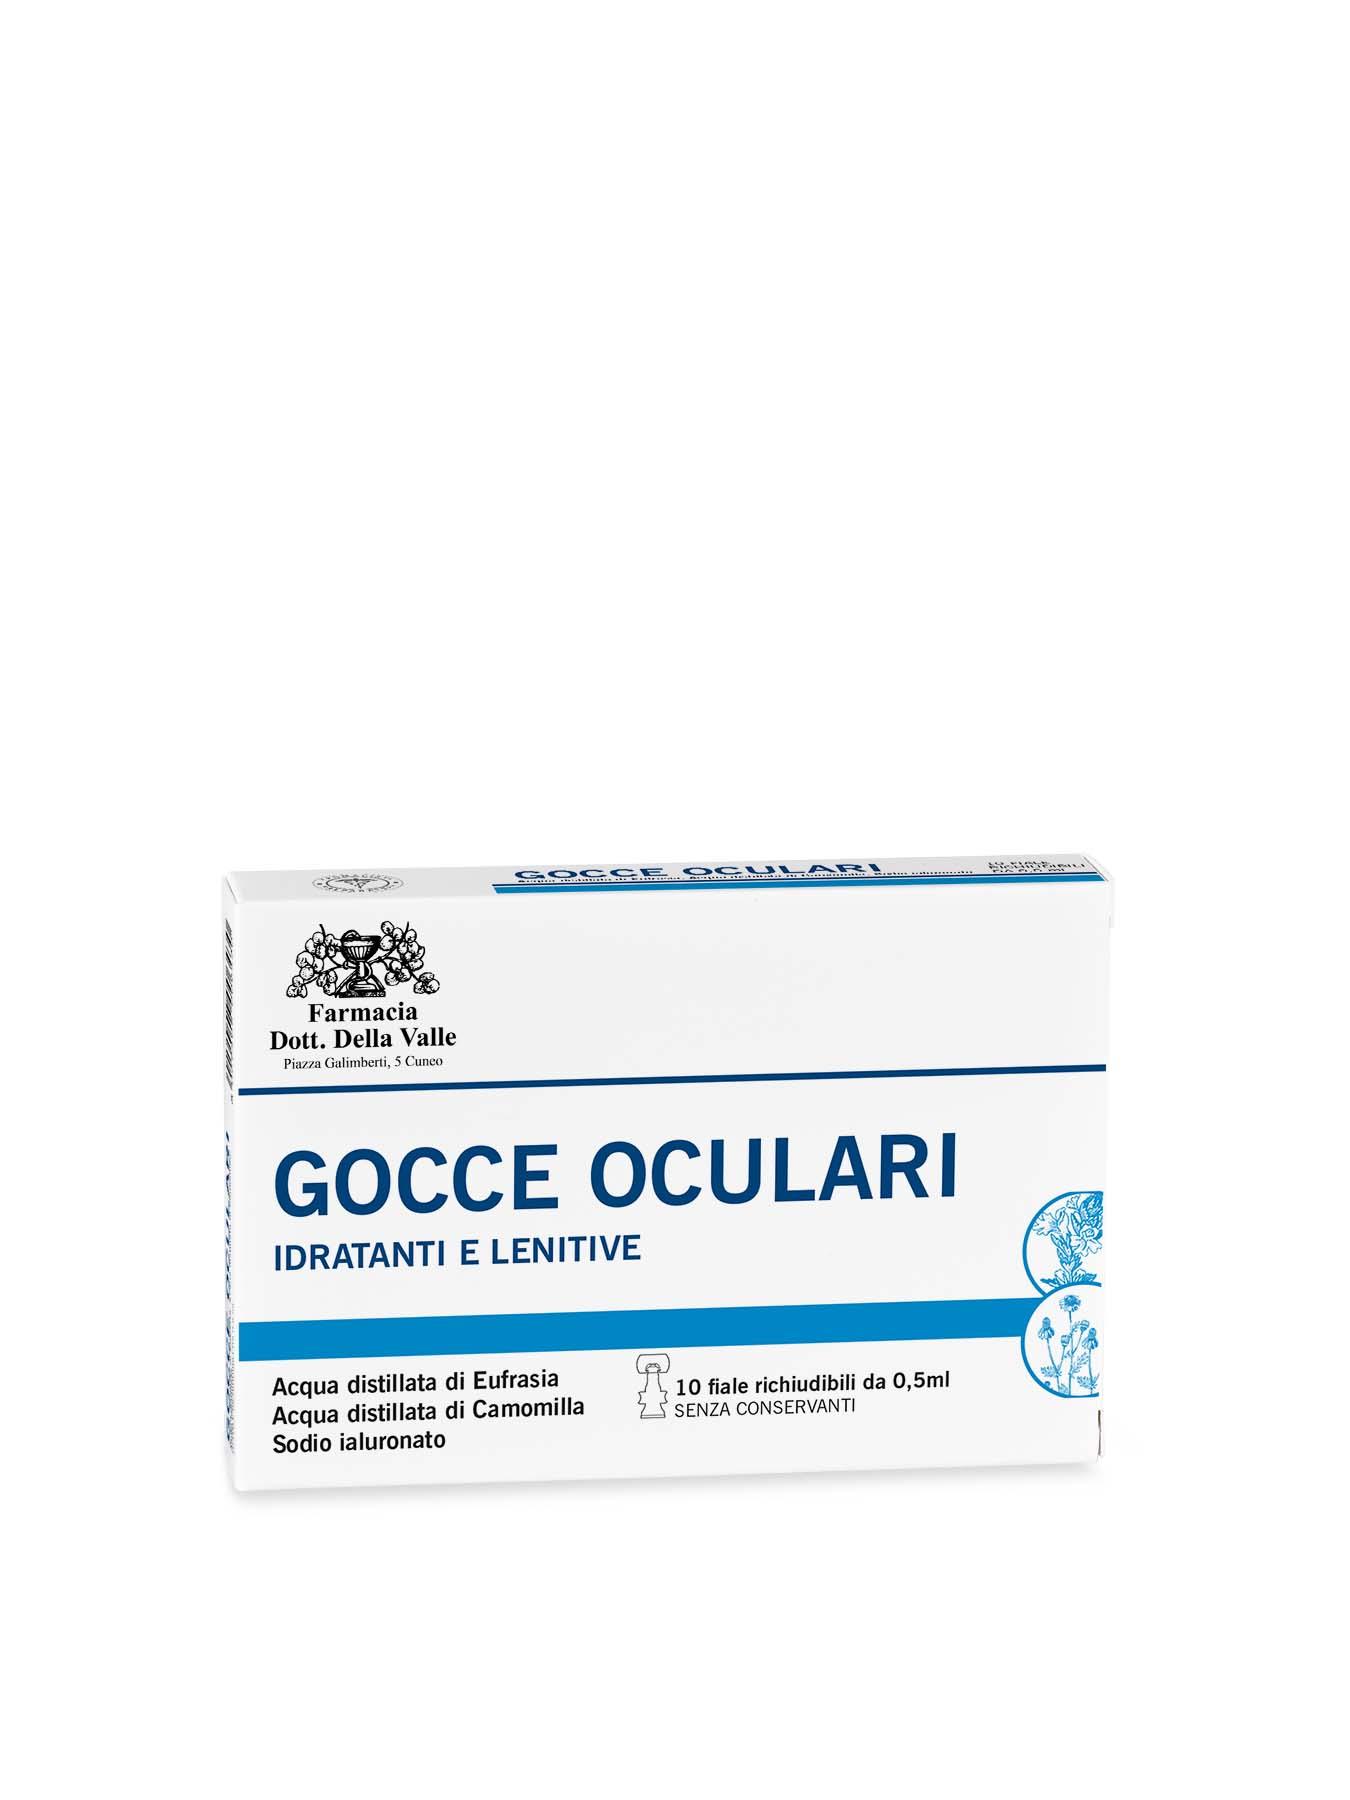 LFP GOCCE OCULARI